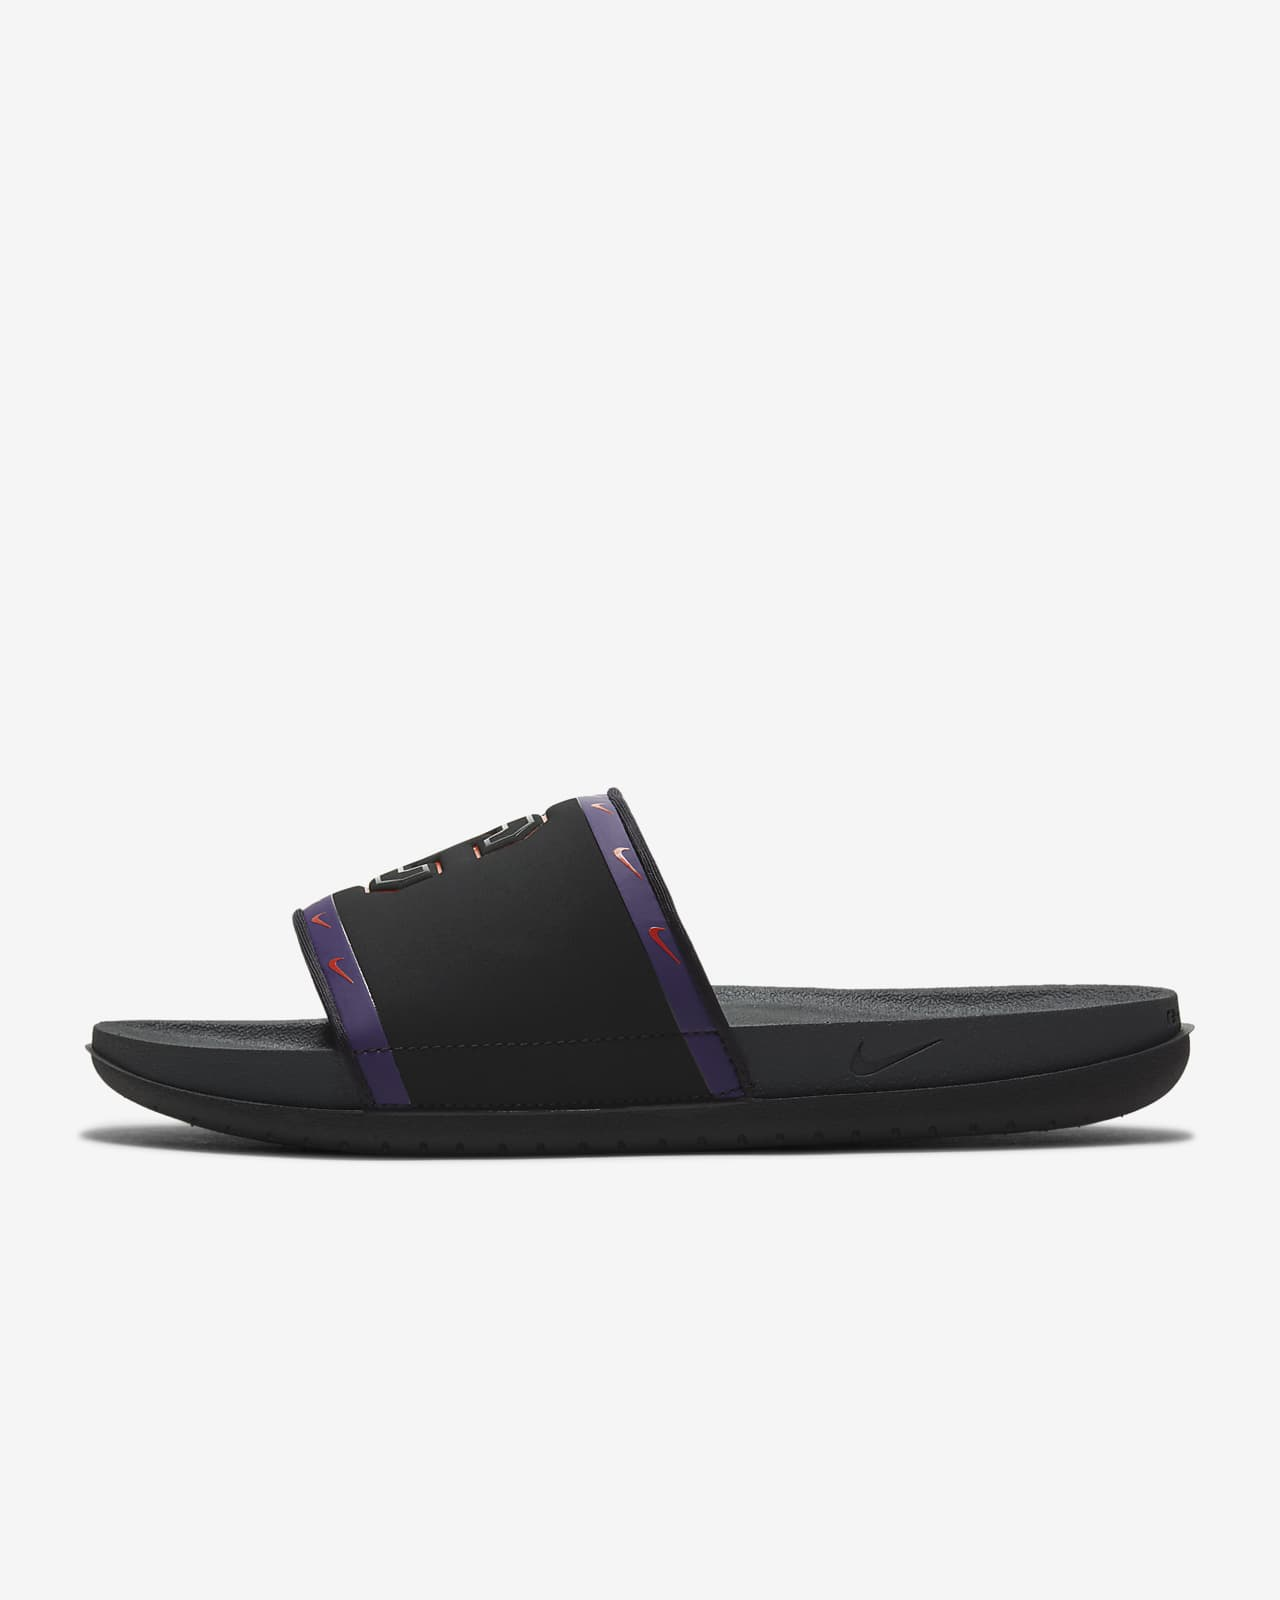 Nike Offcourt (Clemson) Slide